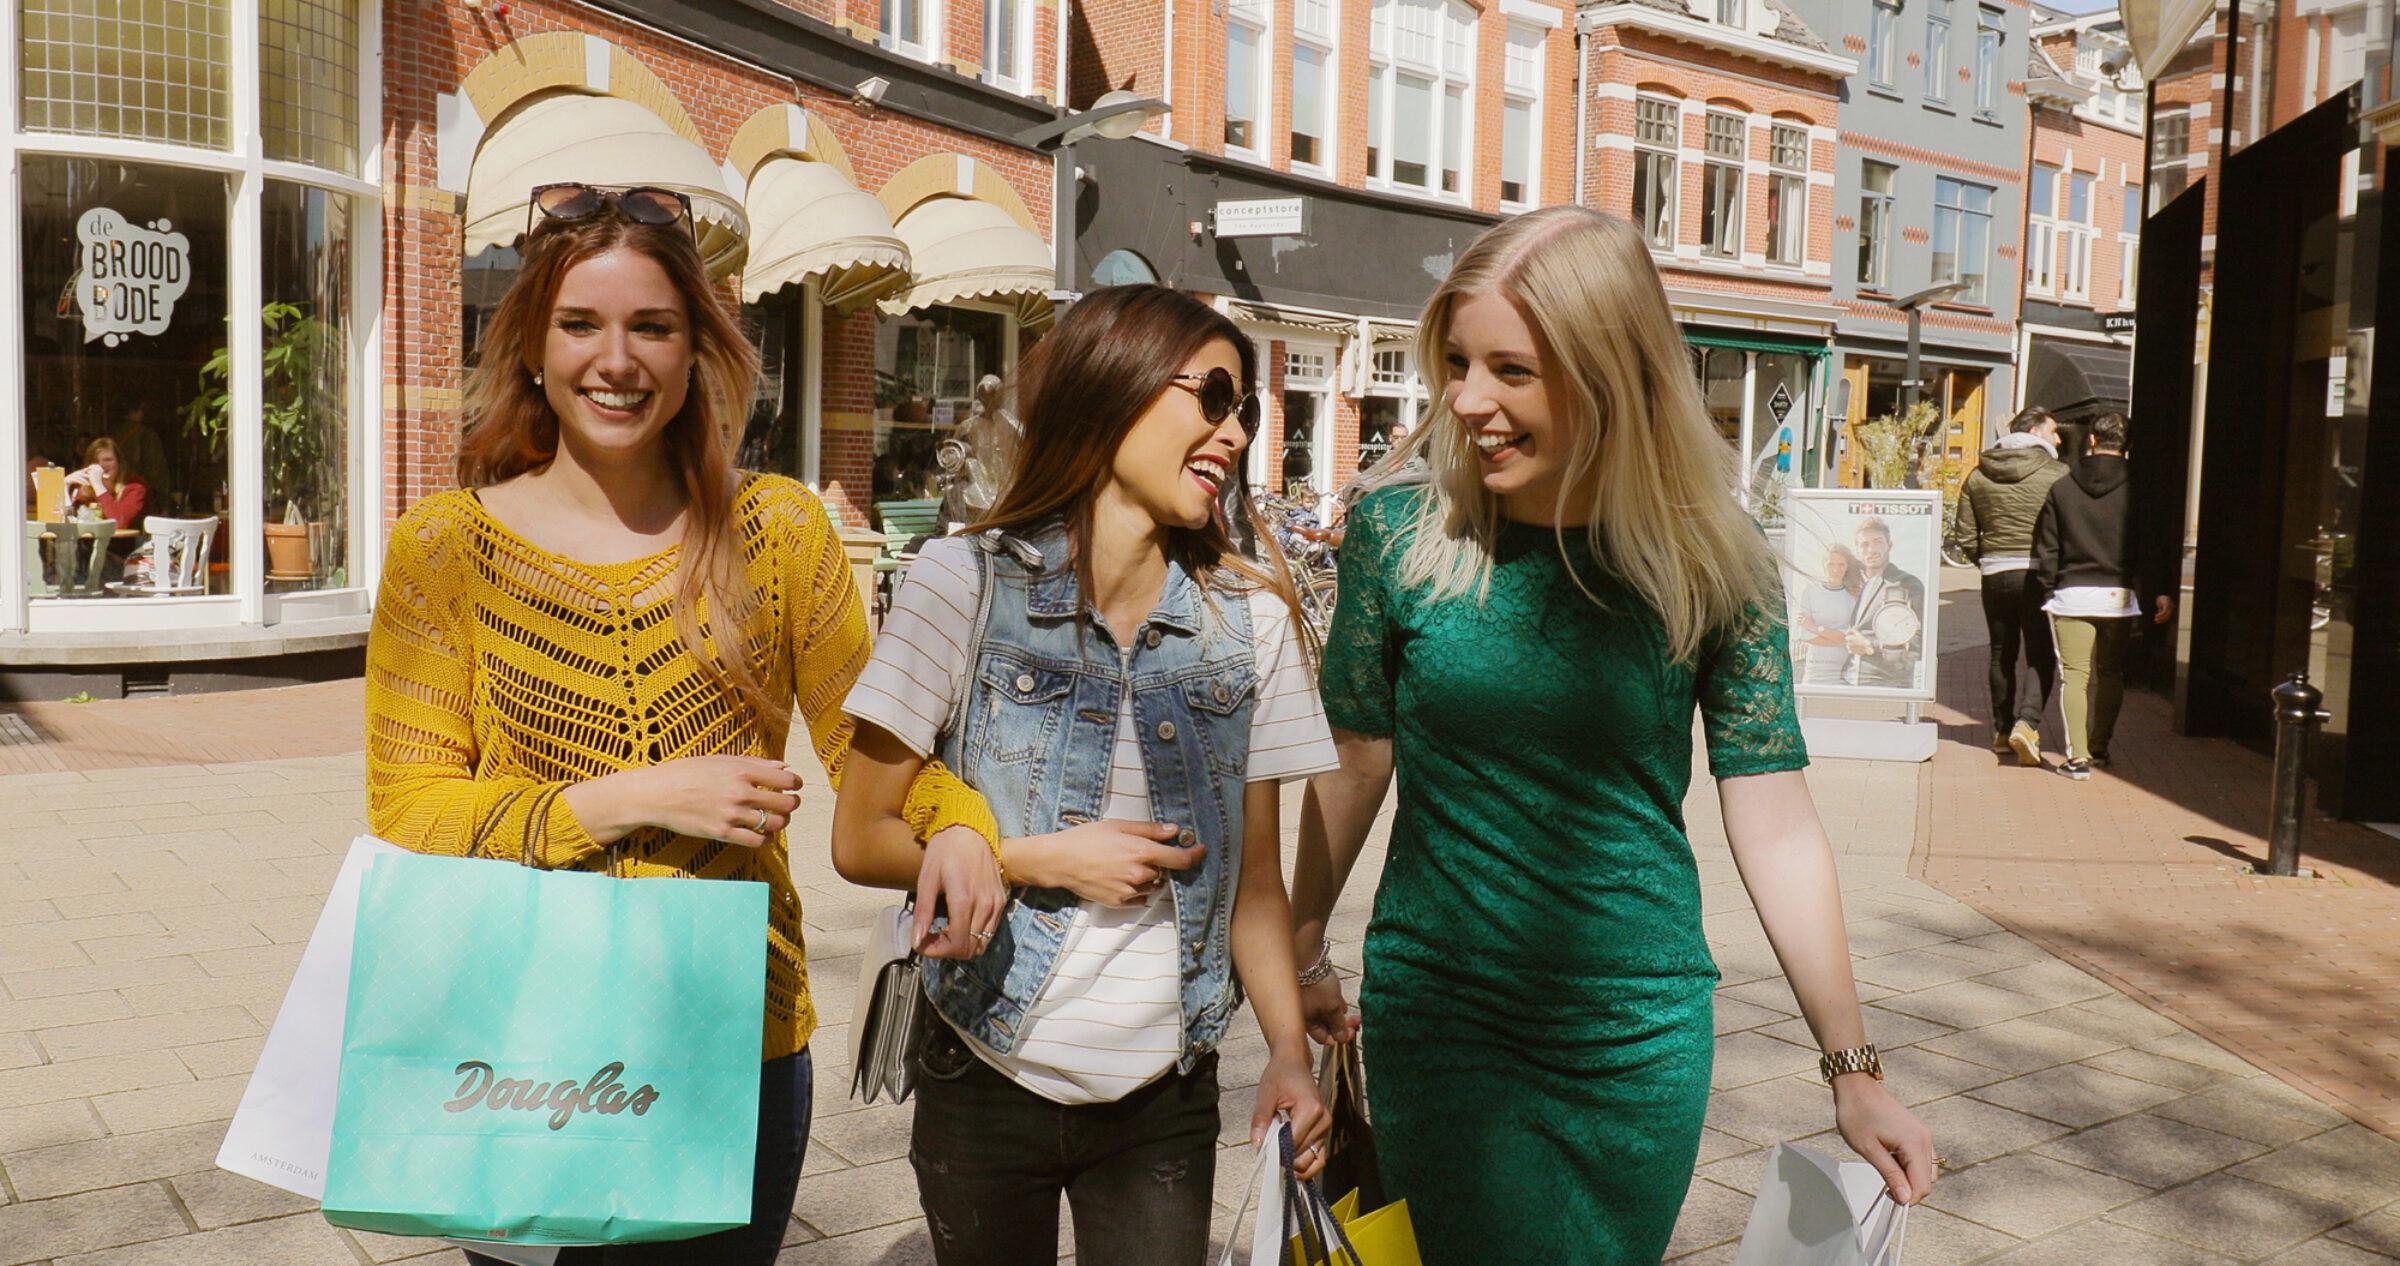 2018 Ebo Fraterman Enschede Staat Je Goed Shopfotos winkelen 1